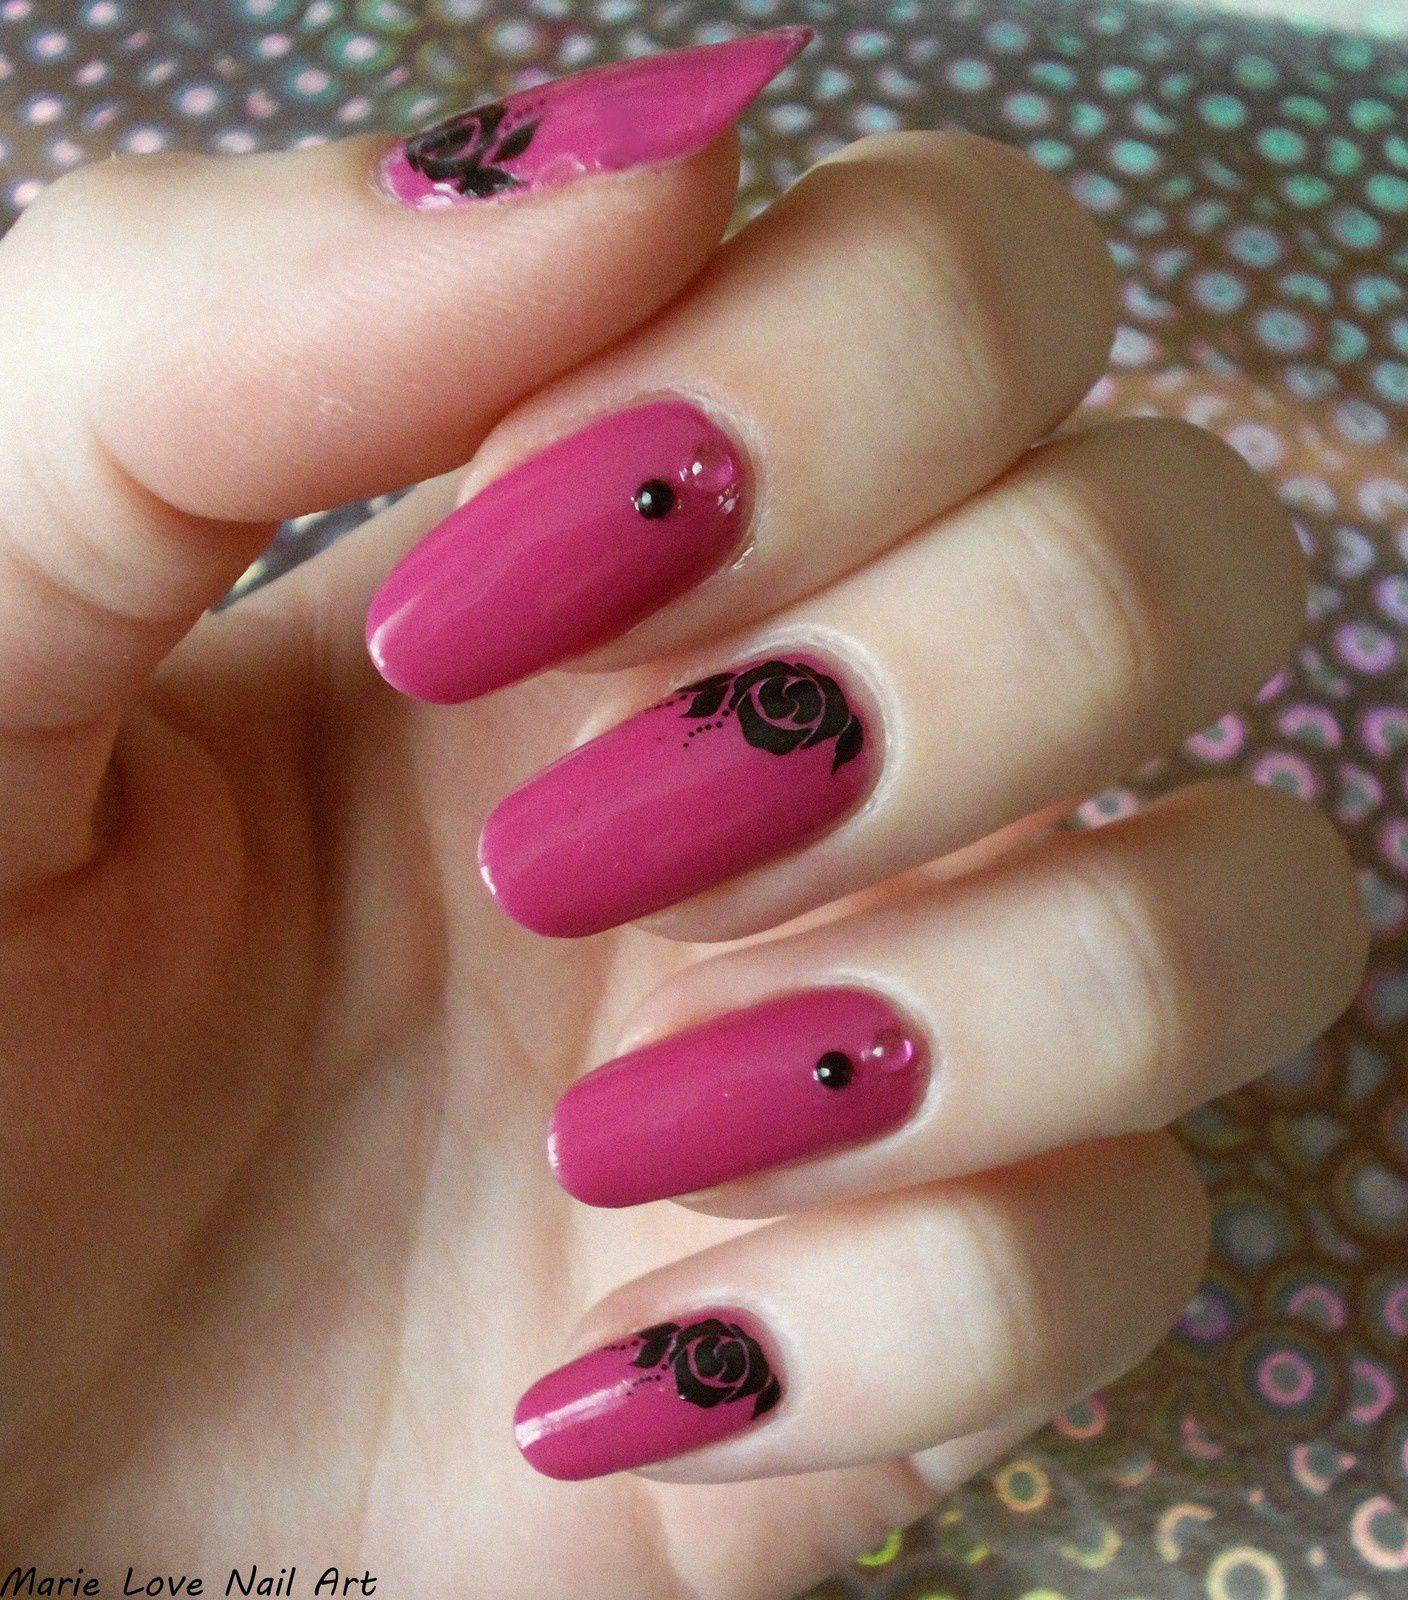 Nail art - Pink &amp&#x3B; Flowers